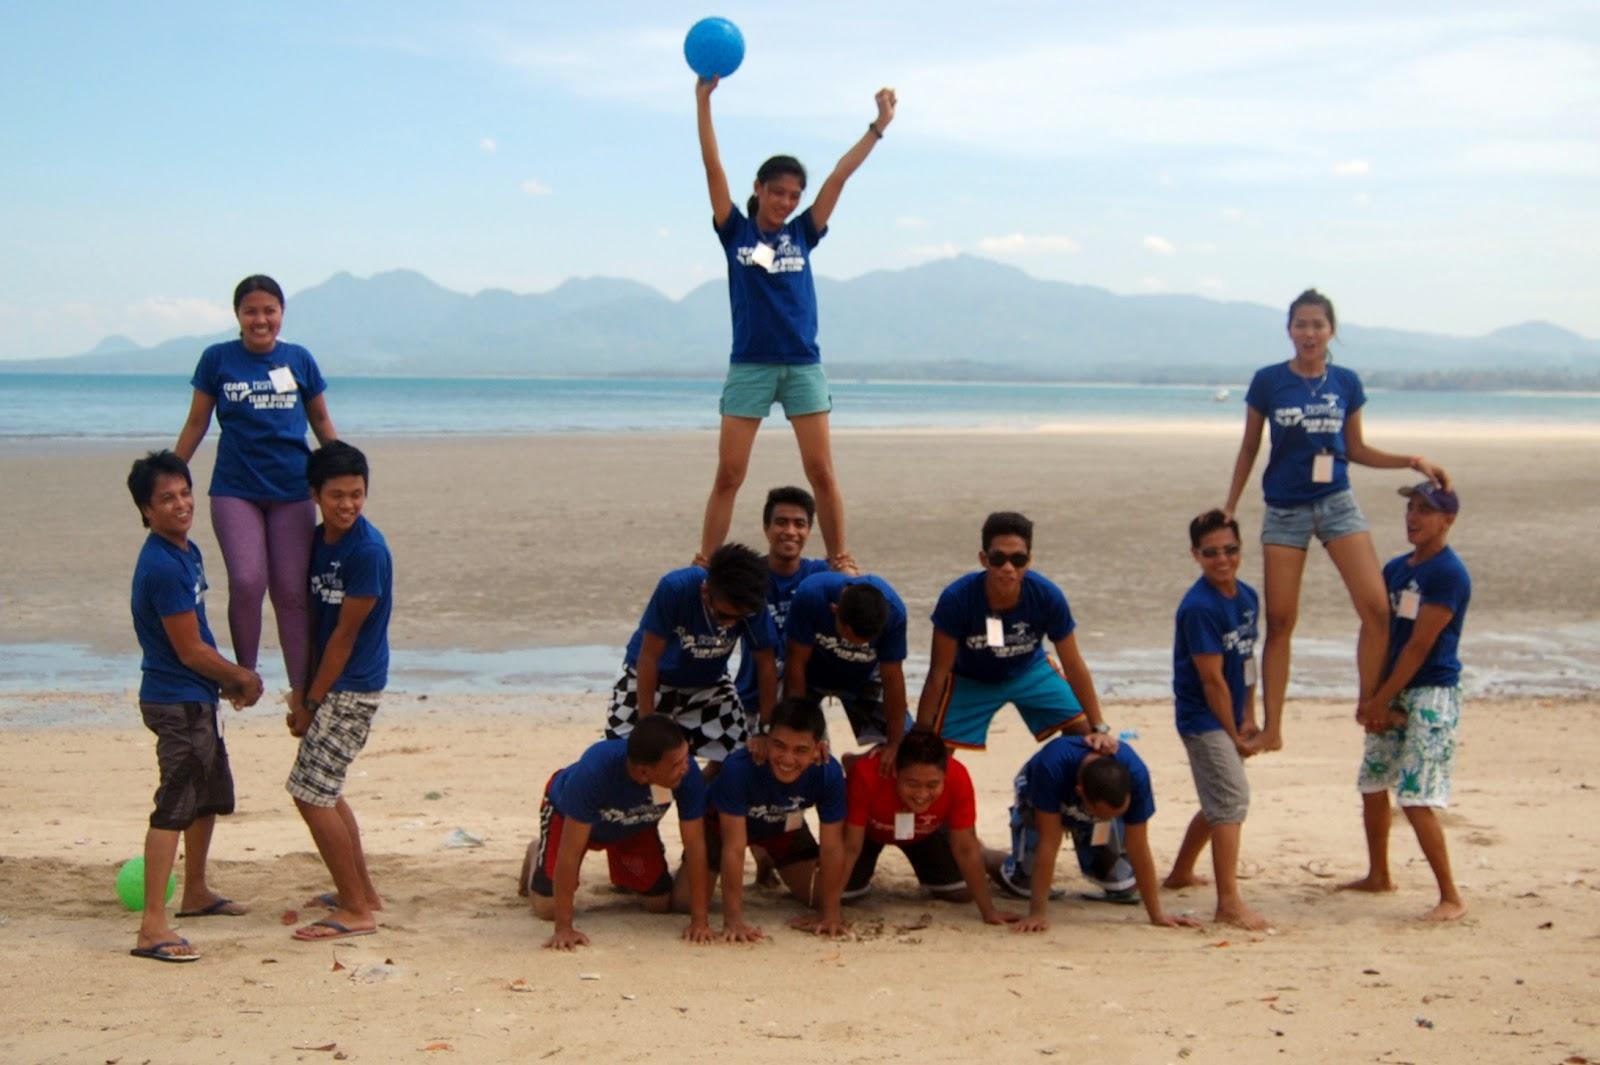 Calaguas Island Tour Calaguas Team Building